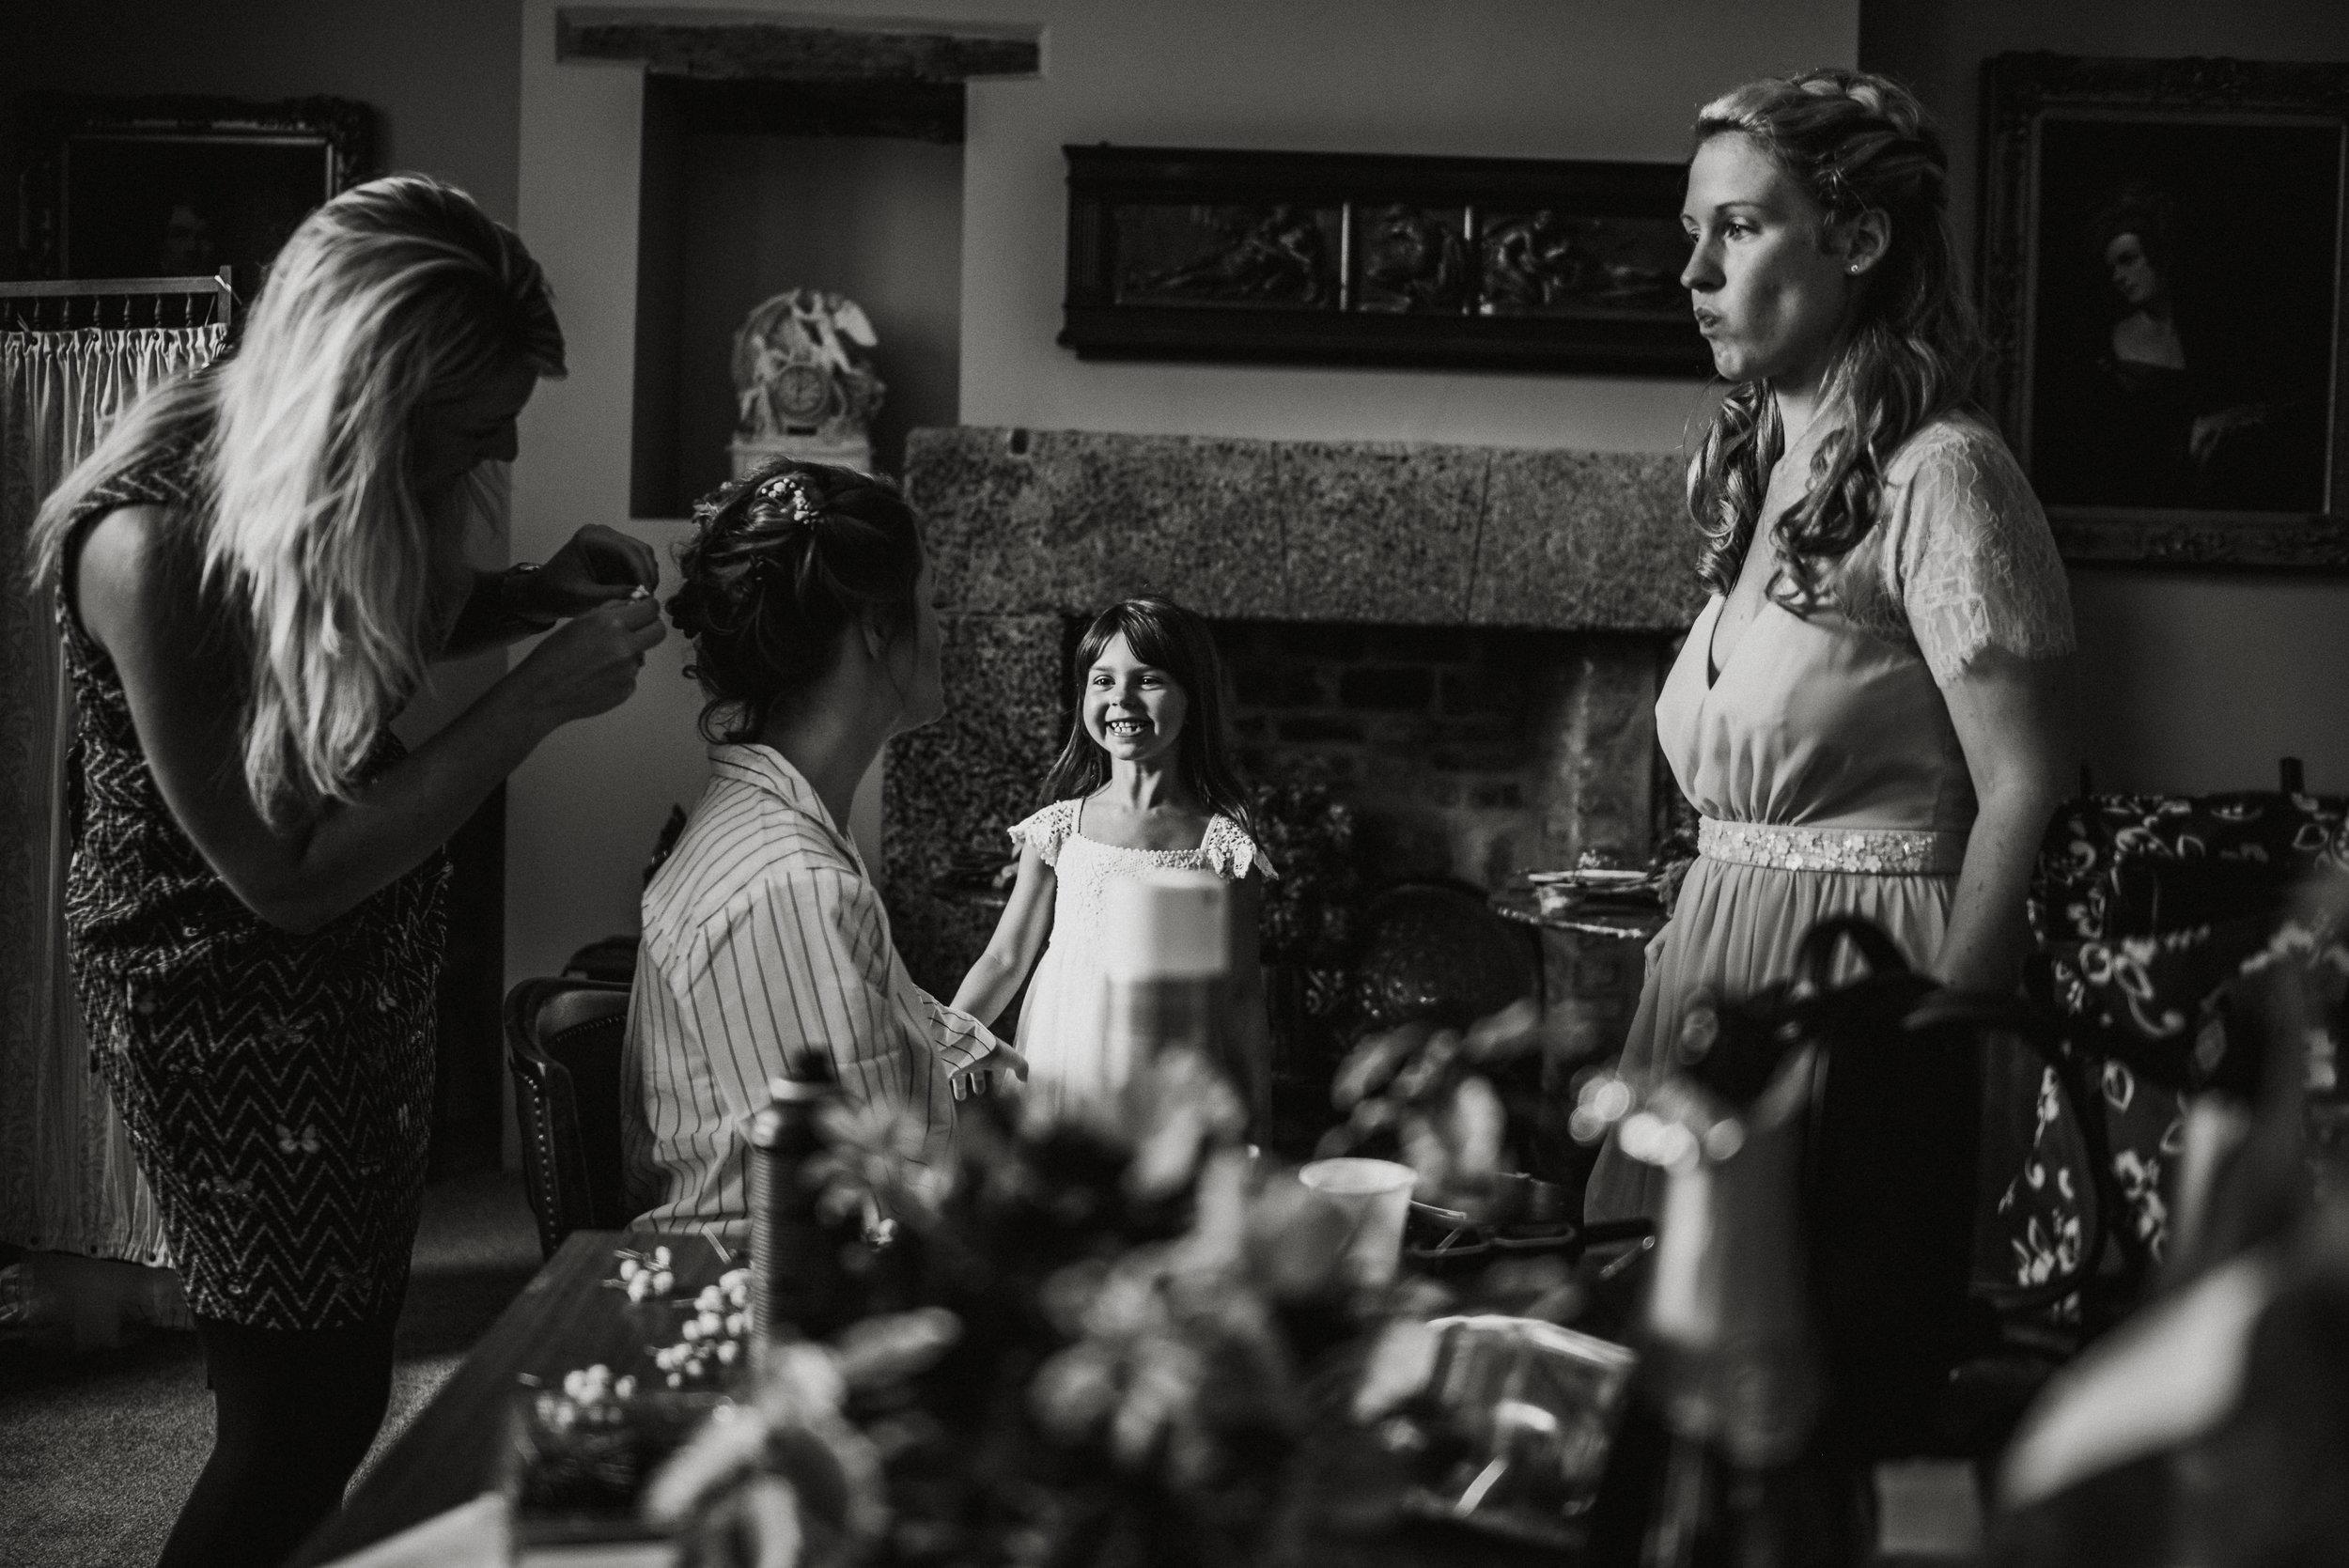 pencarrow-house-wedding-photographer-27.jpg